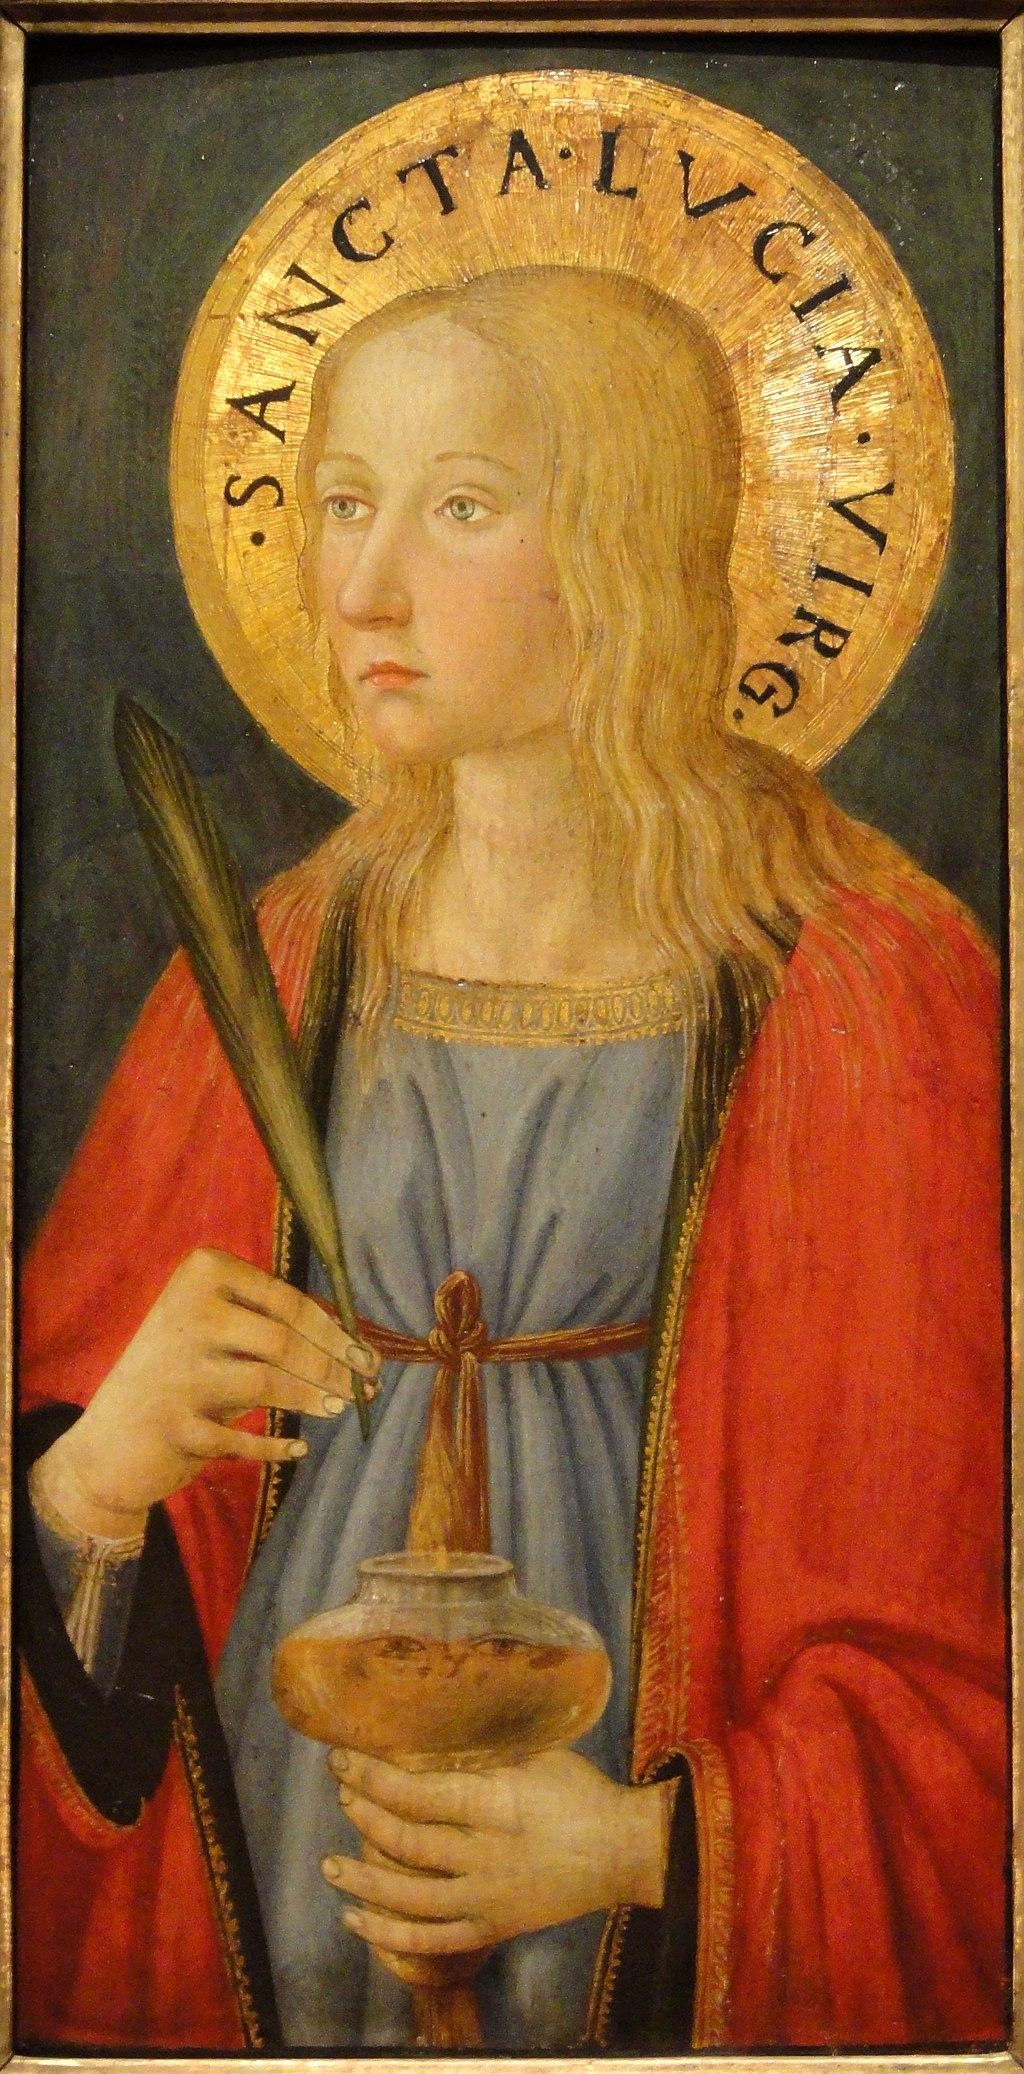 Santa Lucia dans immagini sacre